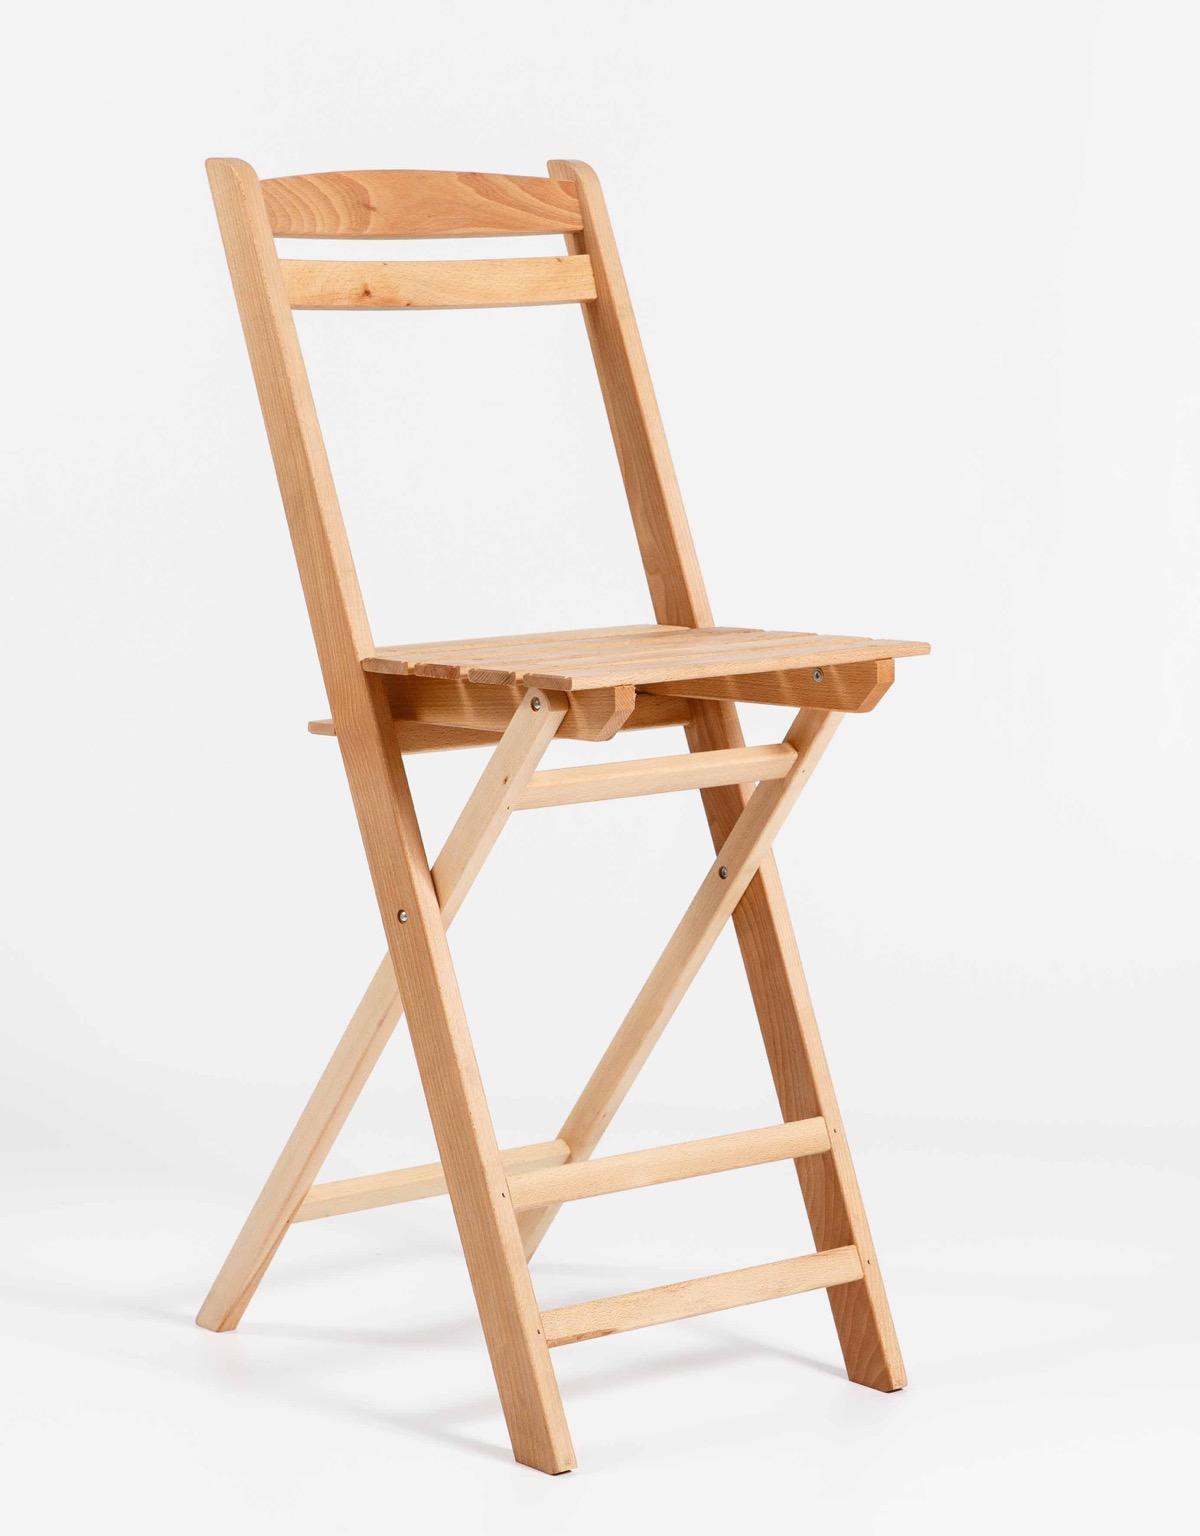 Silla plegable de madera alta garc a hermanos - Silla alta plegable ...